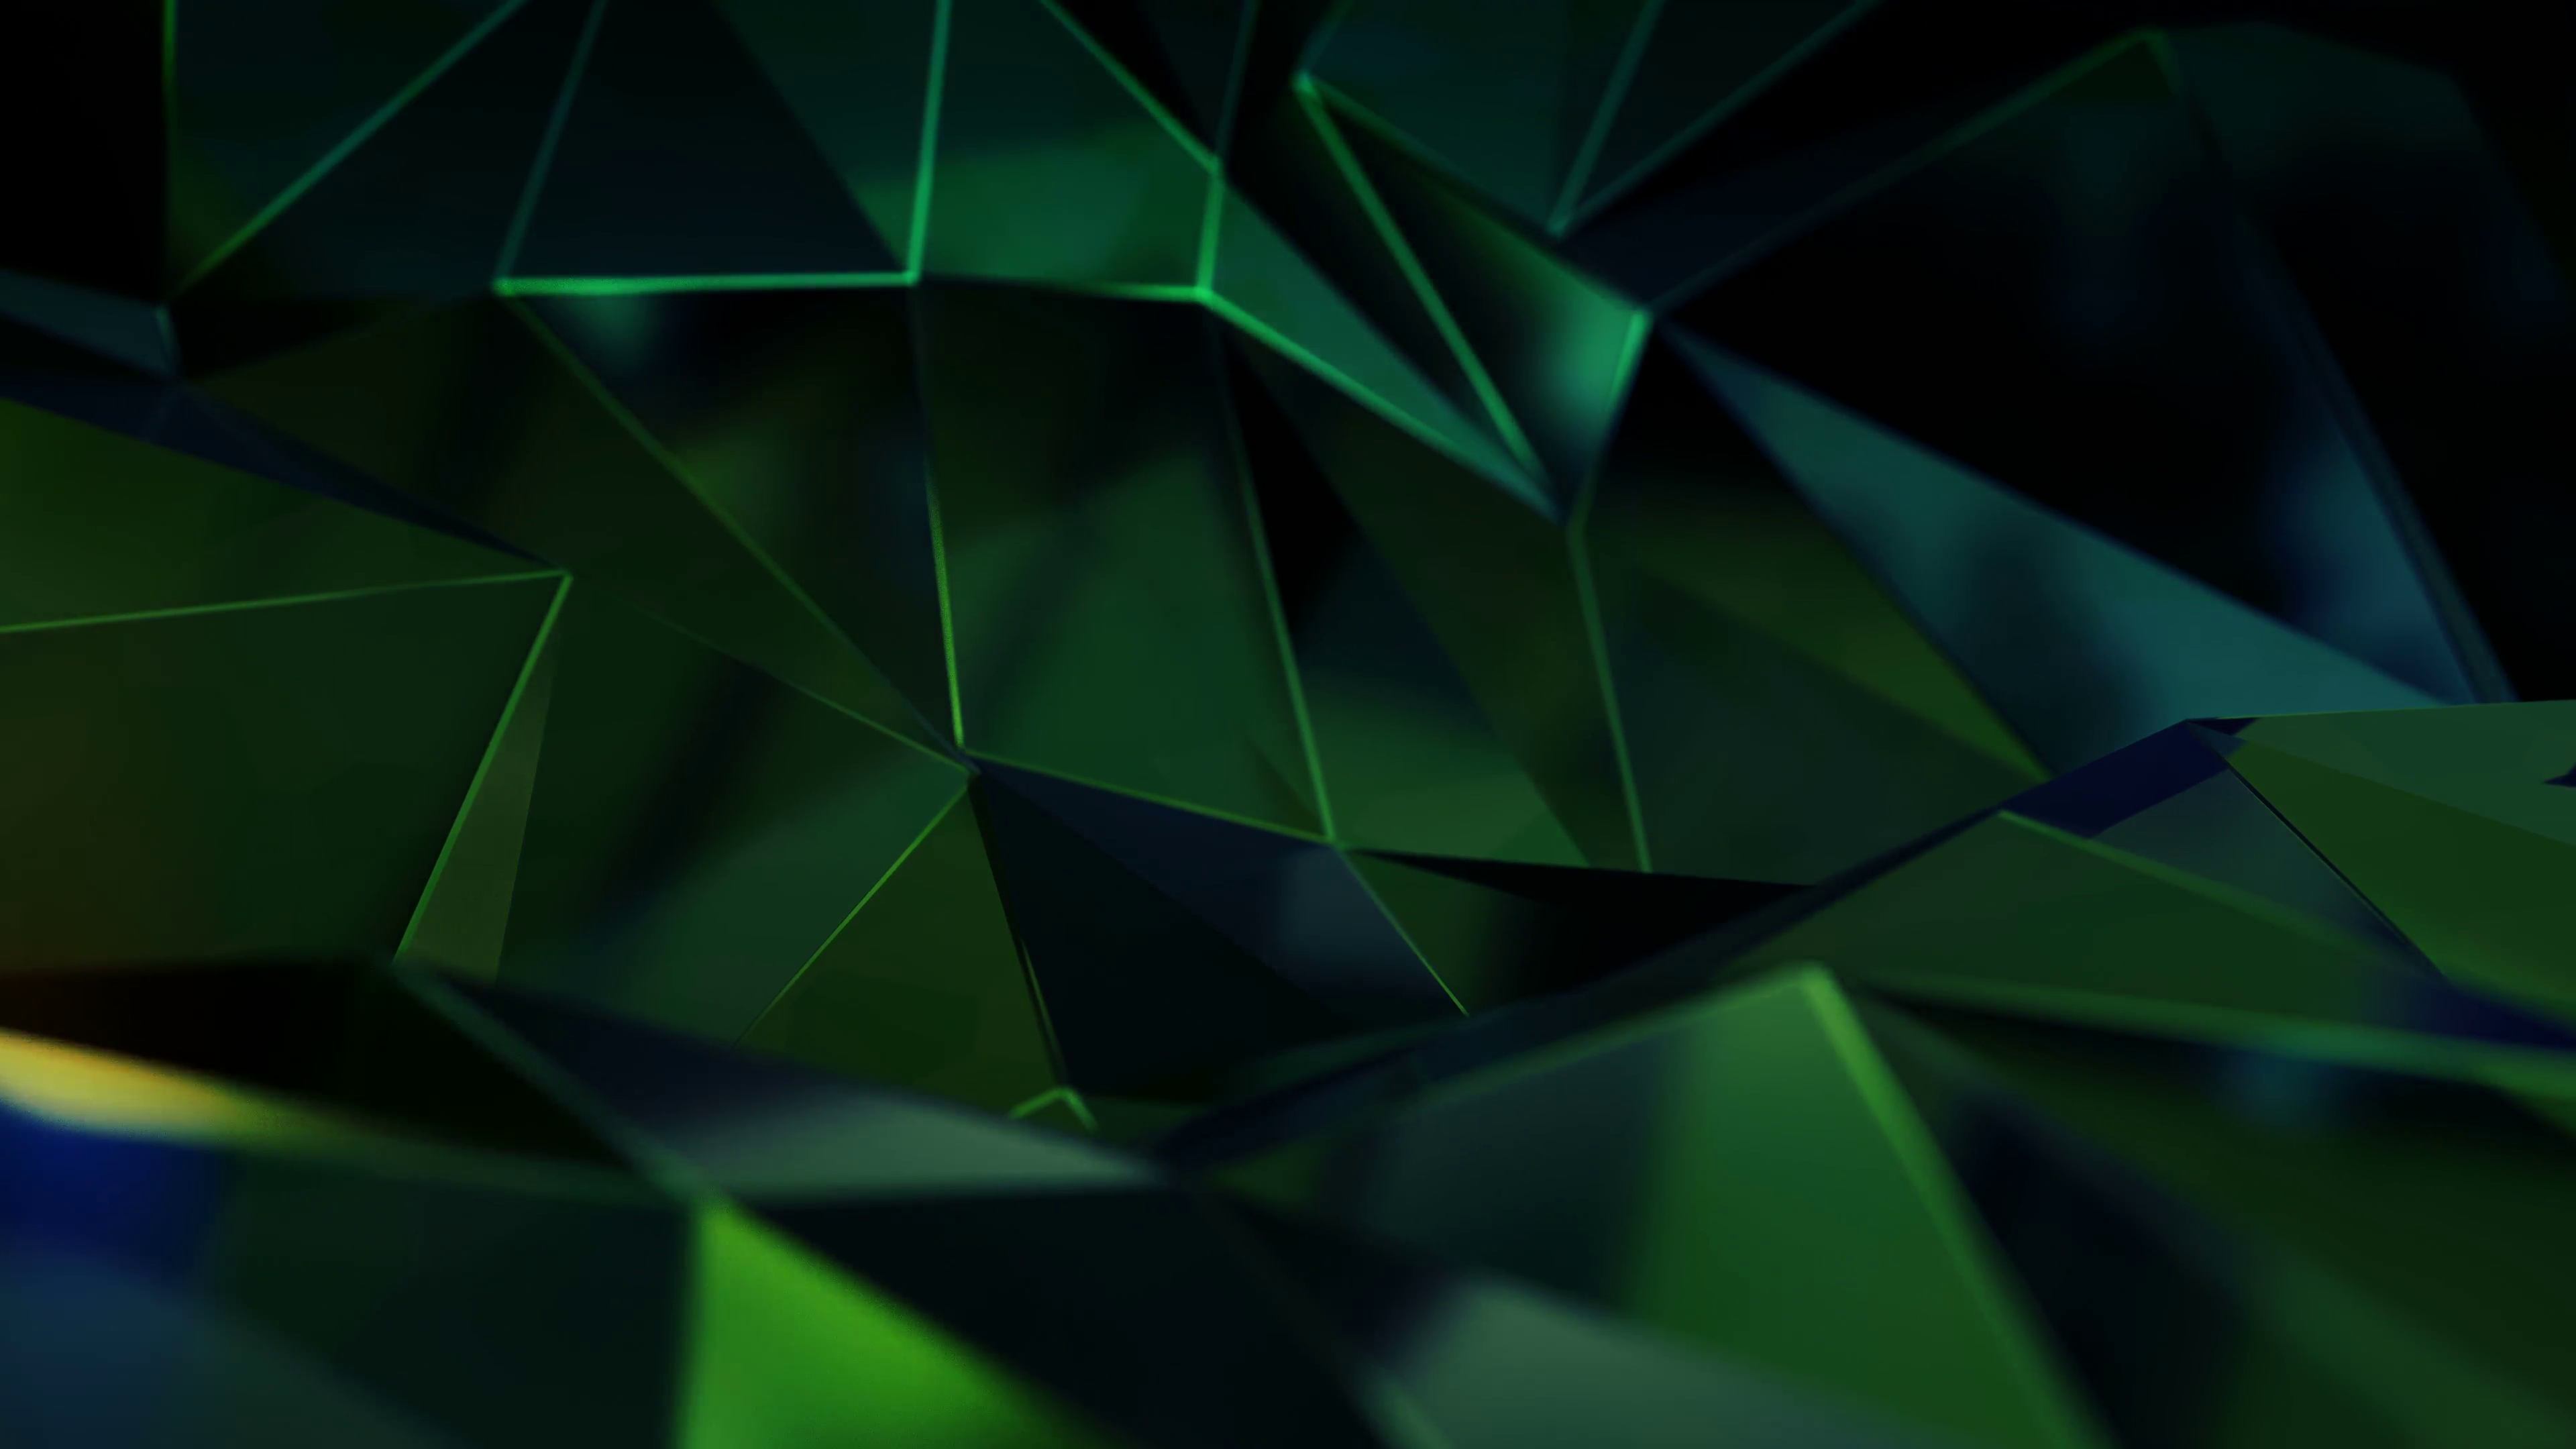 Emeralds Background   4K Looping Motion Background   Storyblocks Video 3840x2160